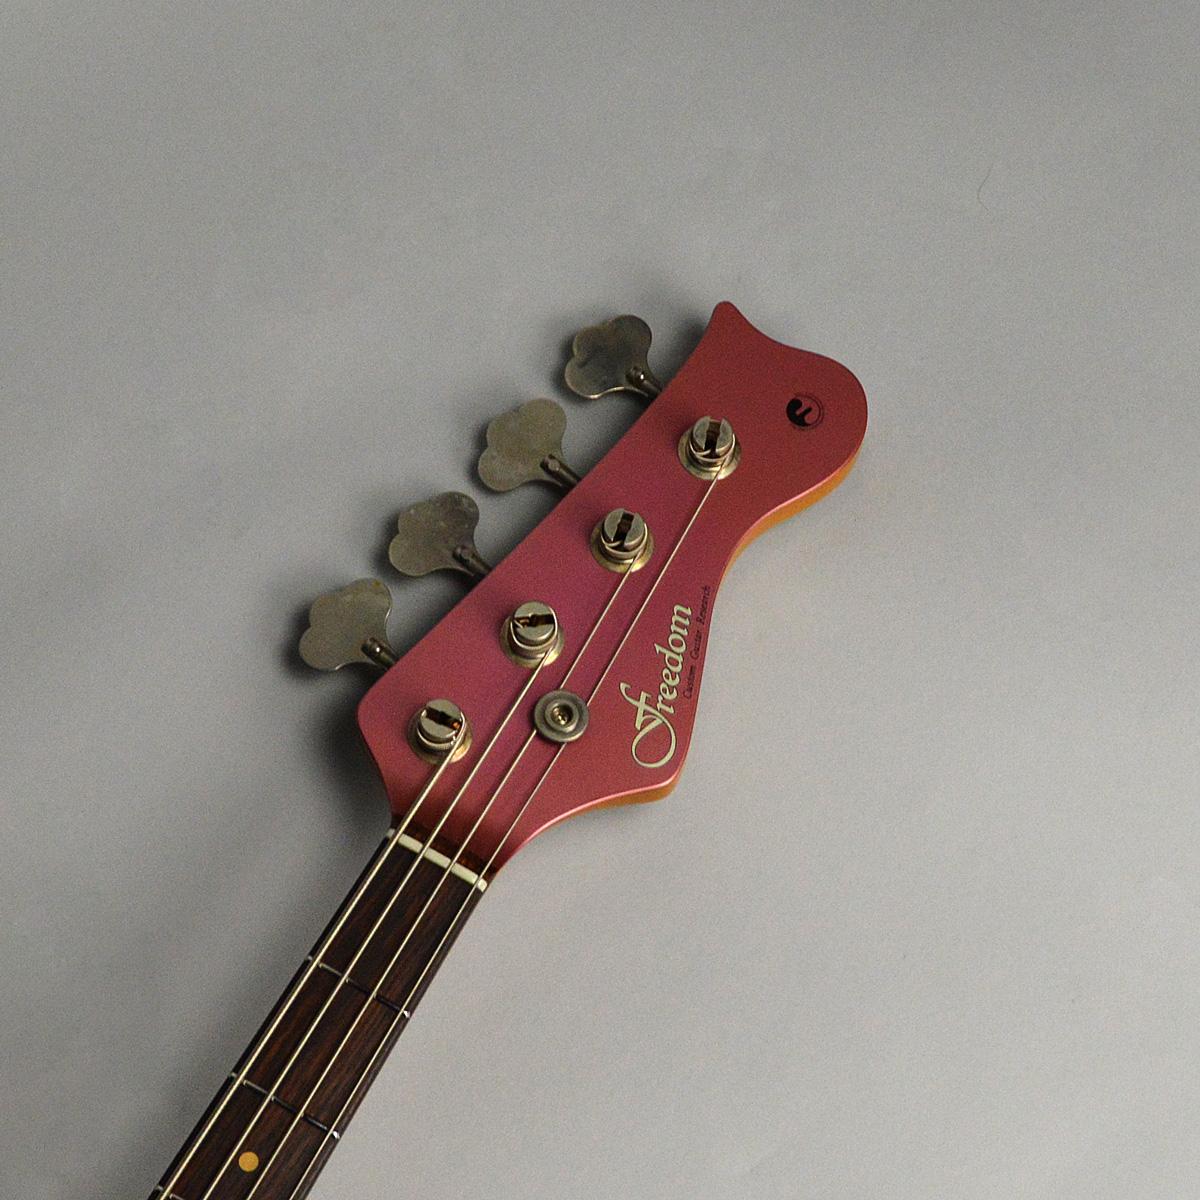 RSJB / Retro Spective Jazz Bassのヘッド画像